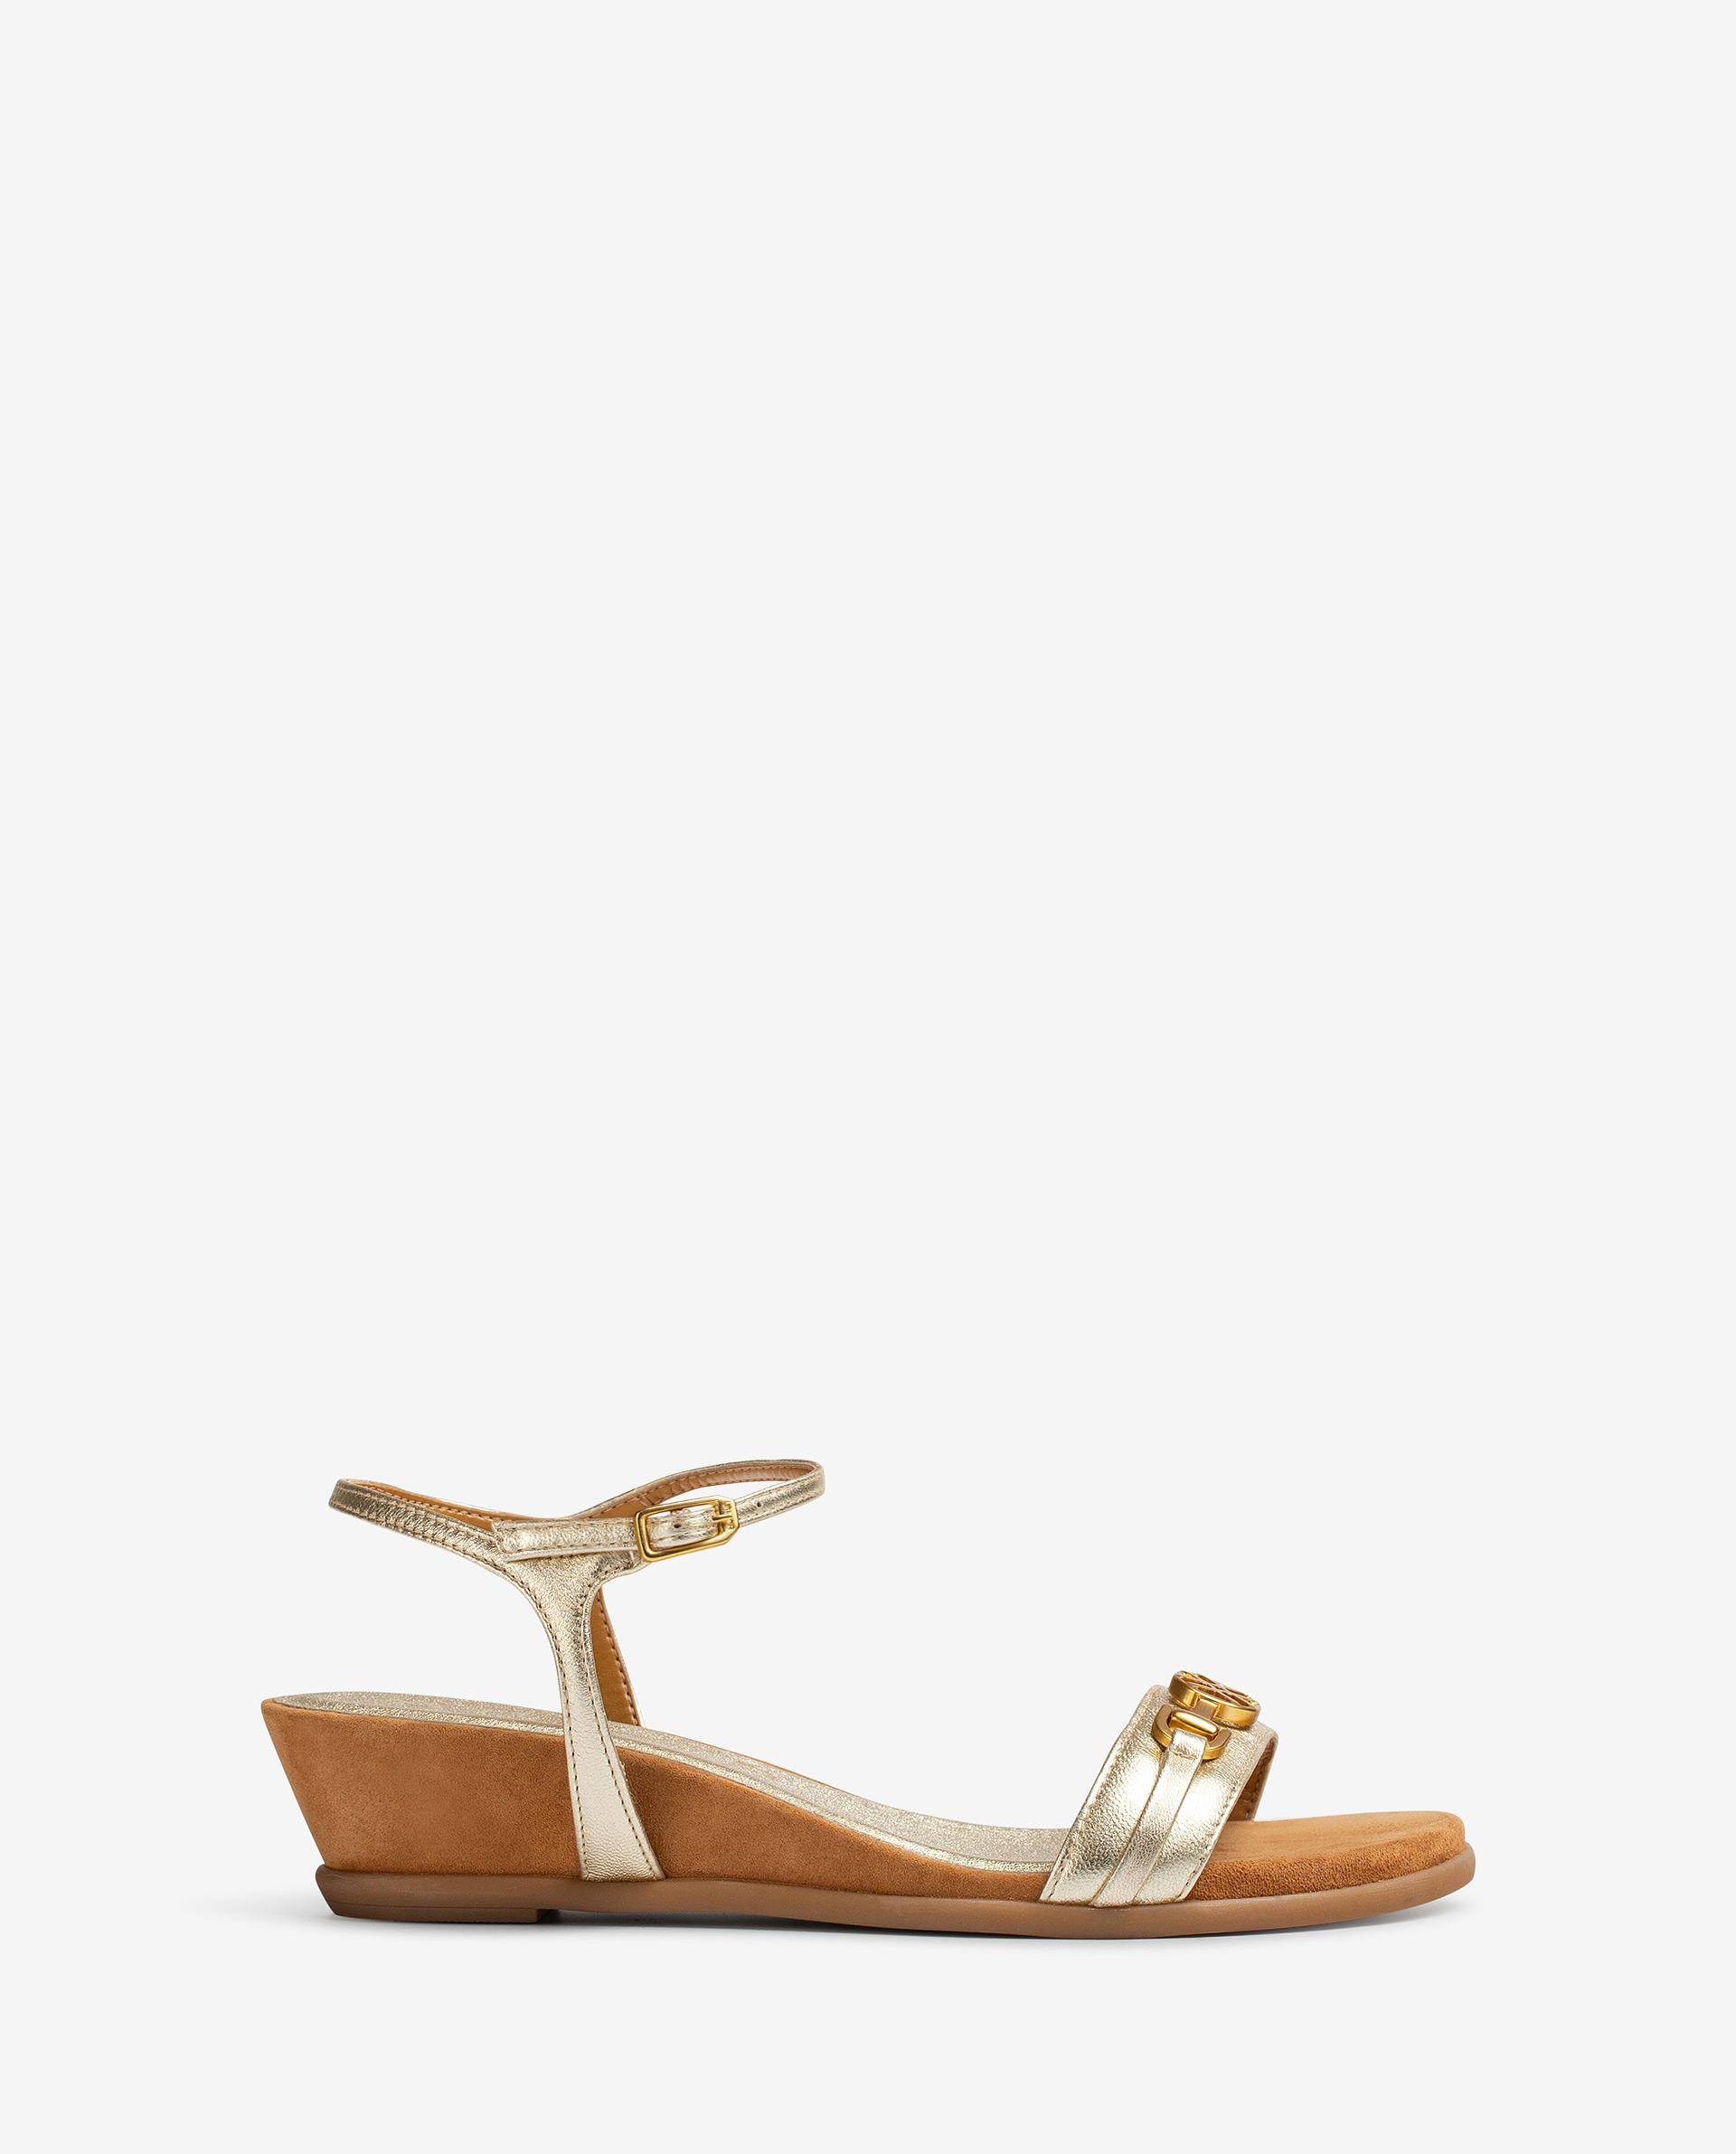 UNISA Metal effect leather thong sandals BENAFER_LMT 2